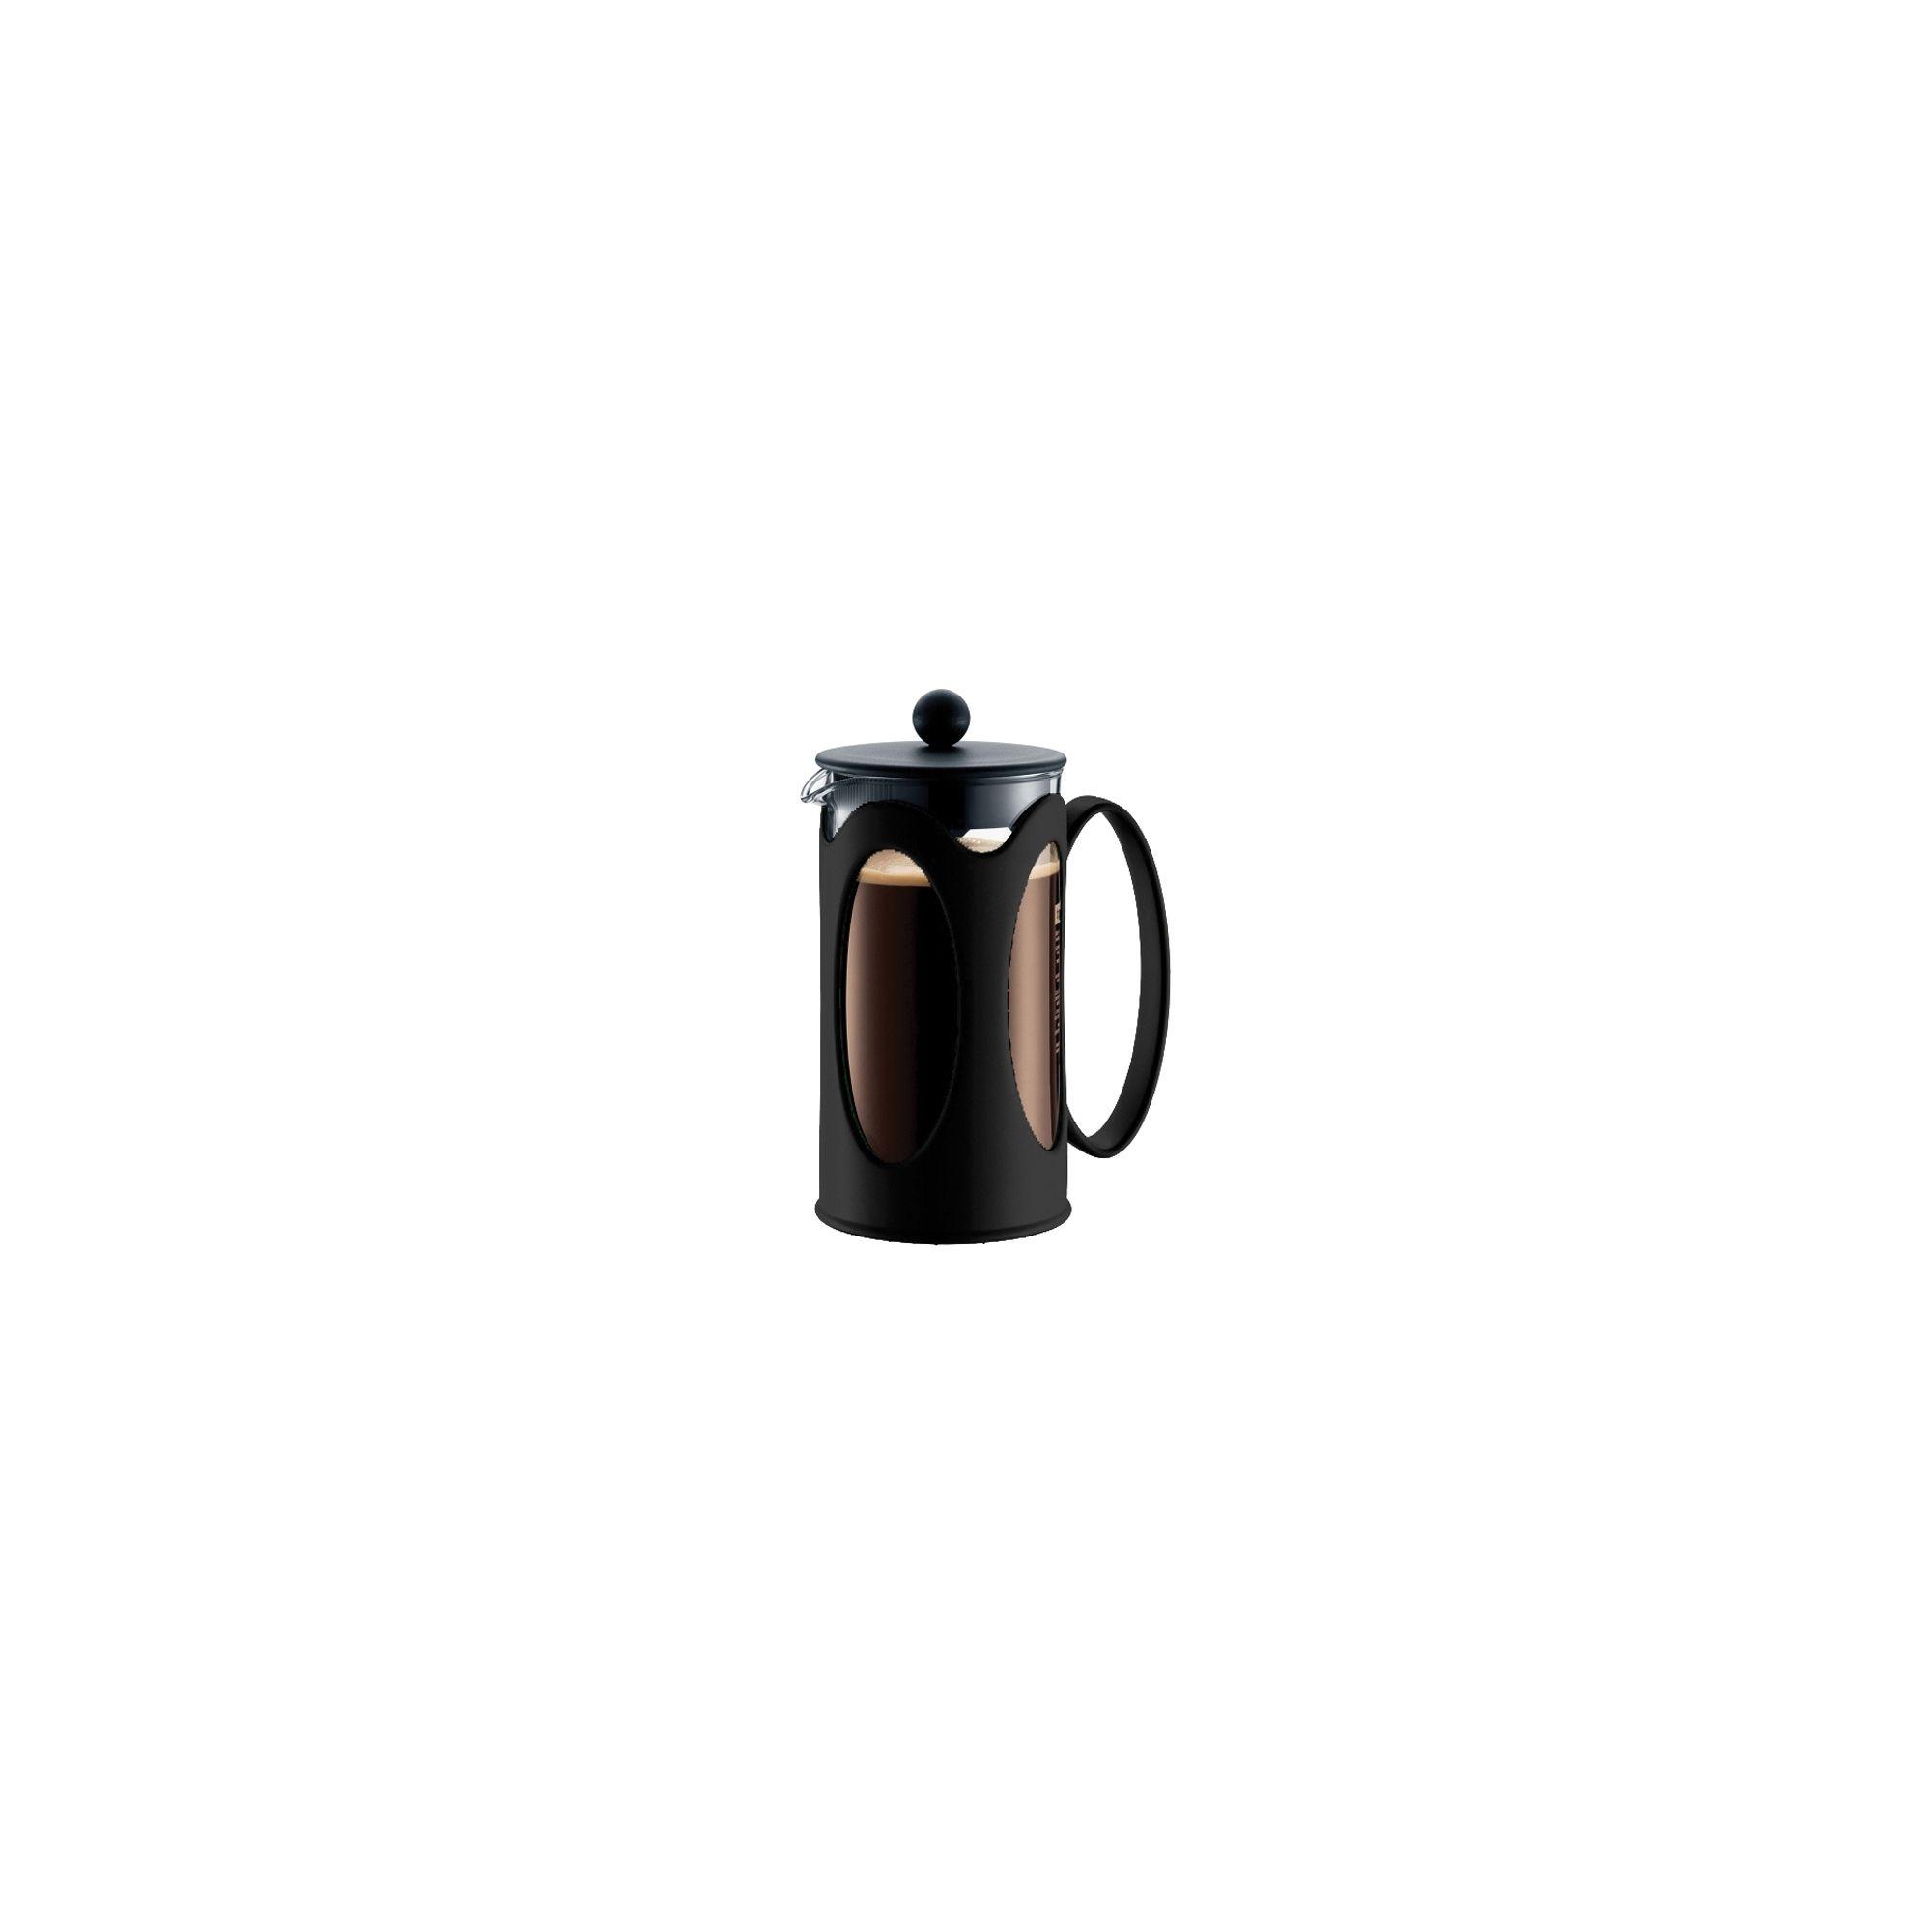 French Press Coffee Maker Tesco : Myshop